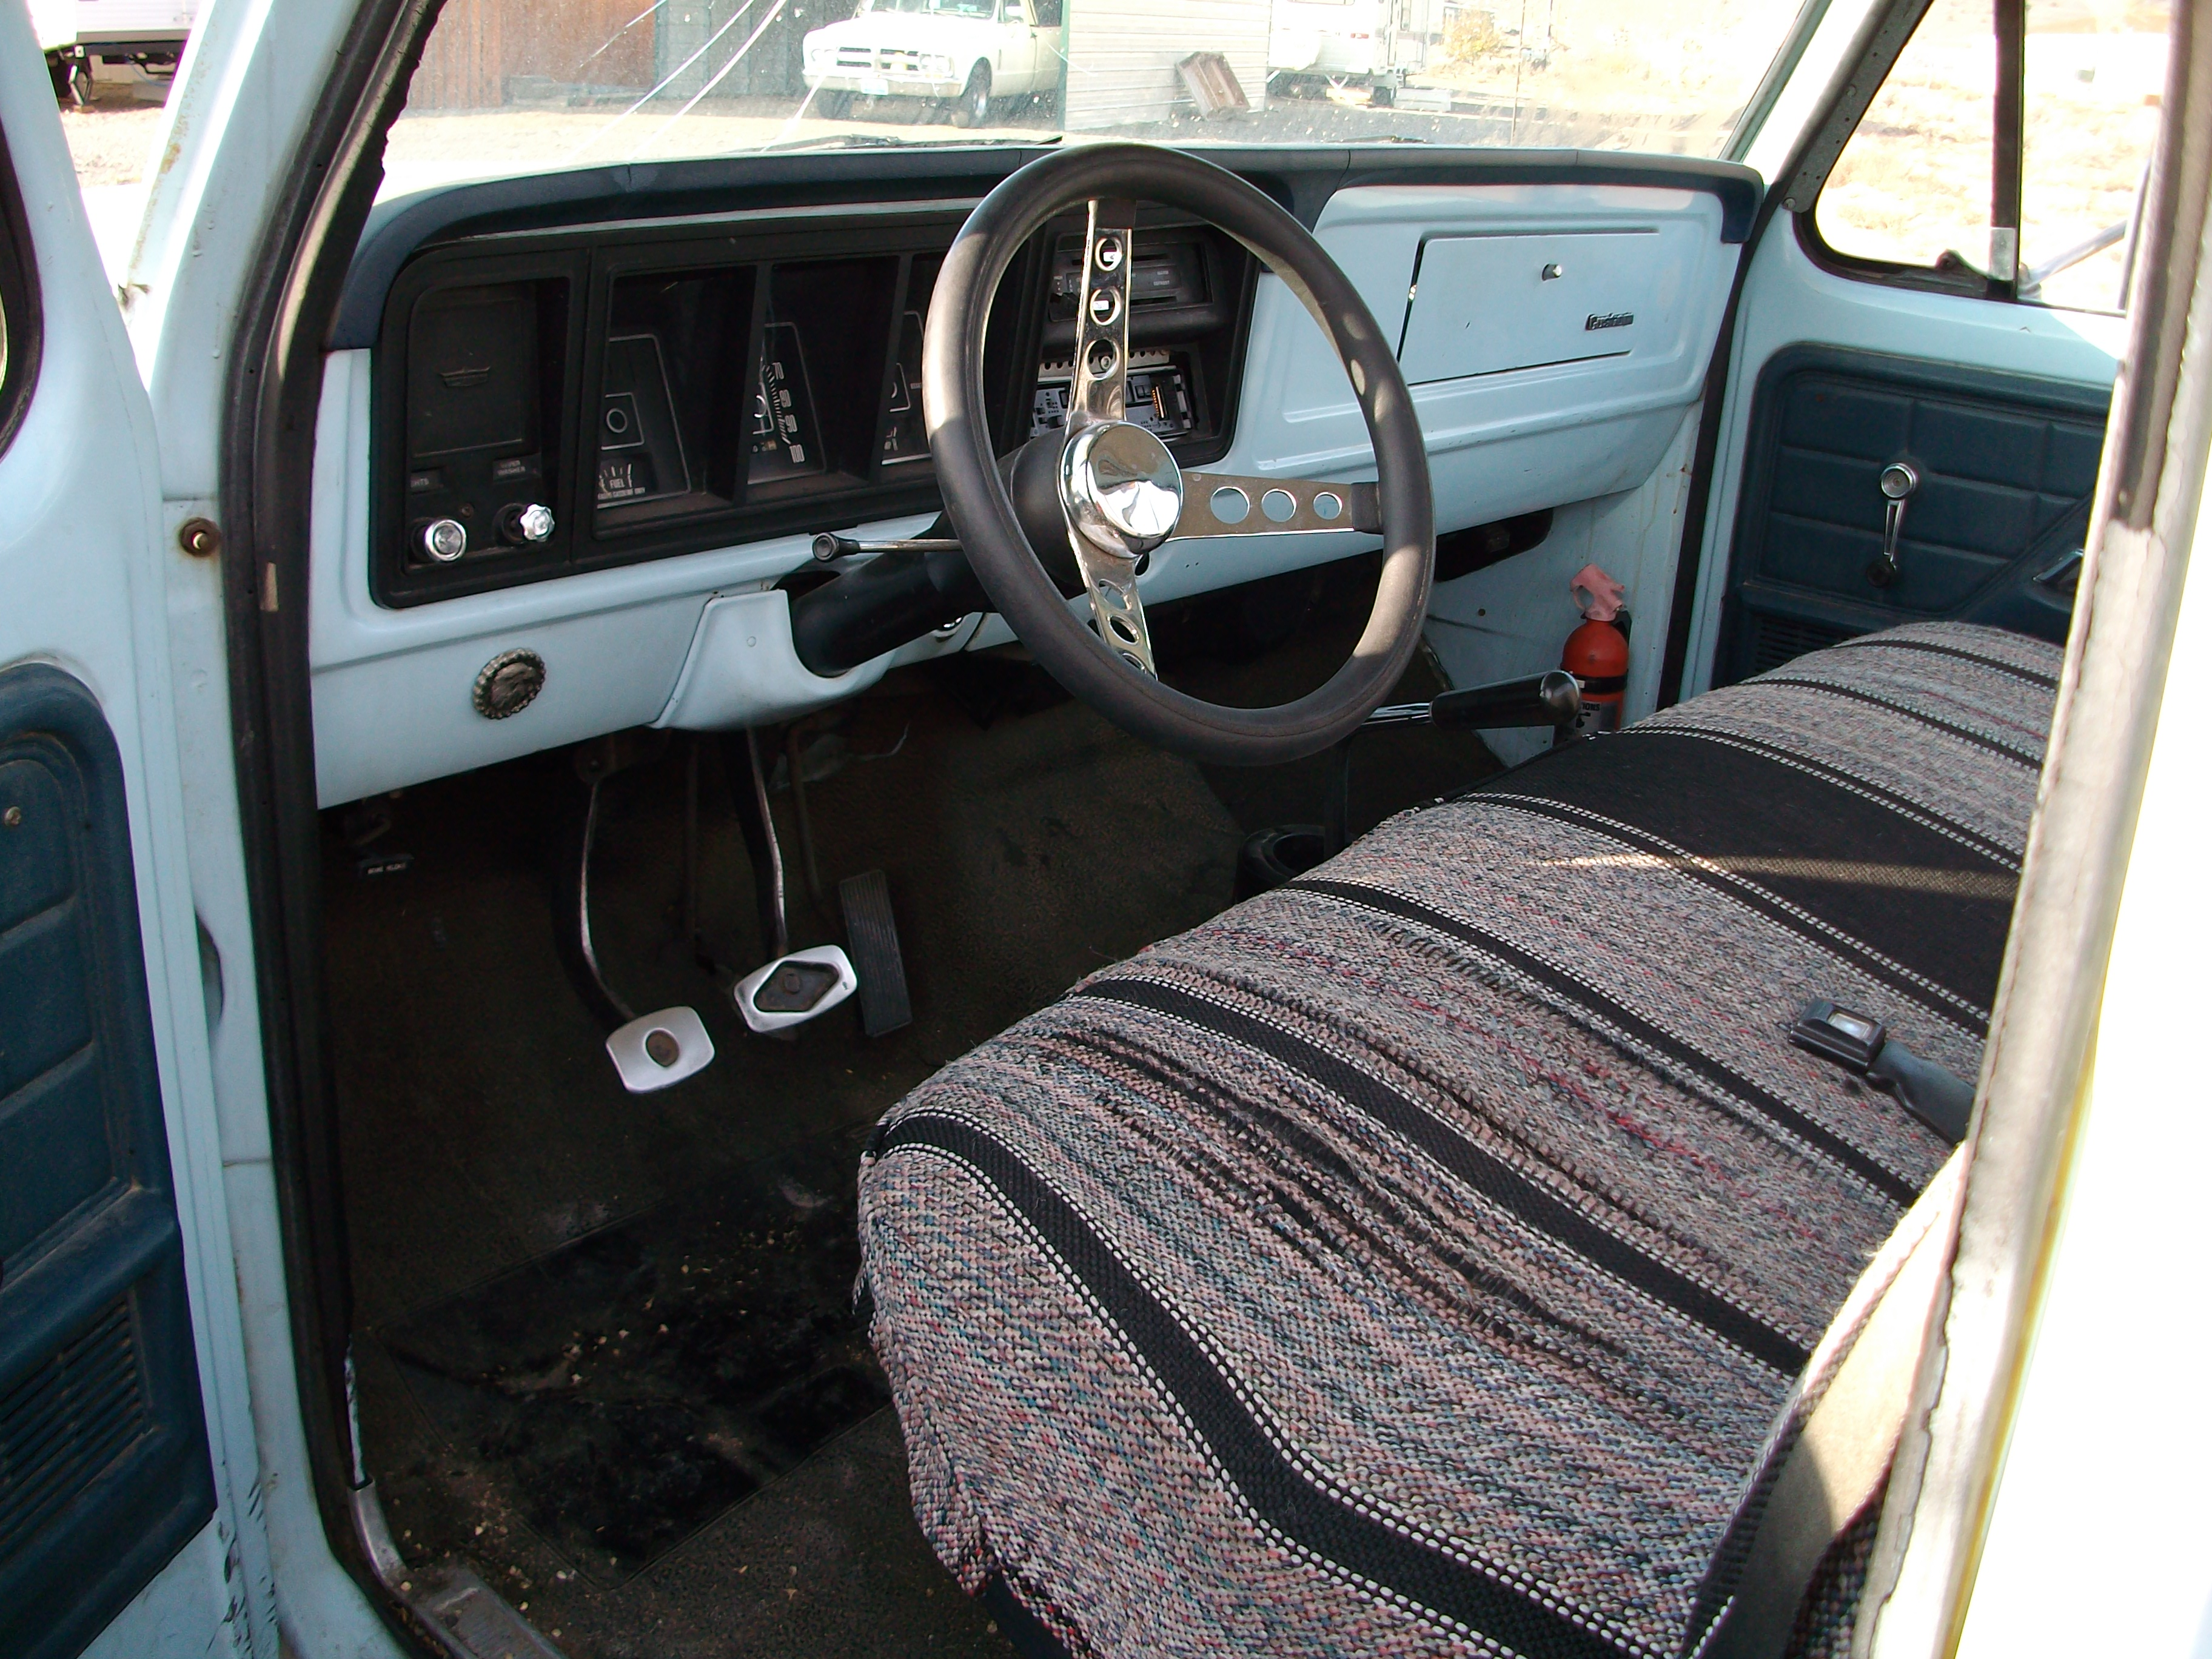 1976 F100 Inside Cab